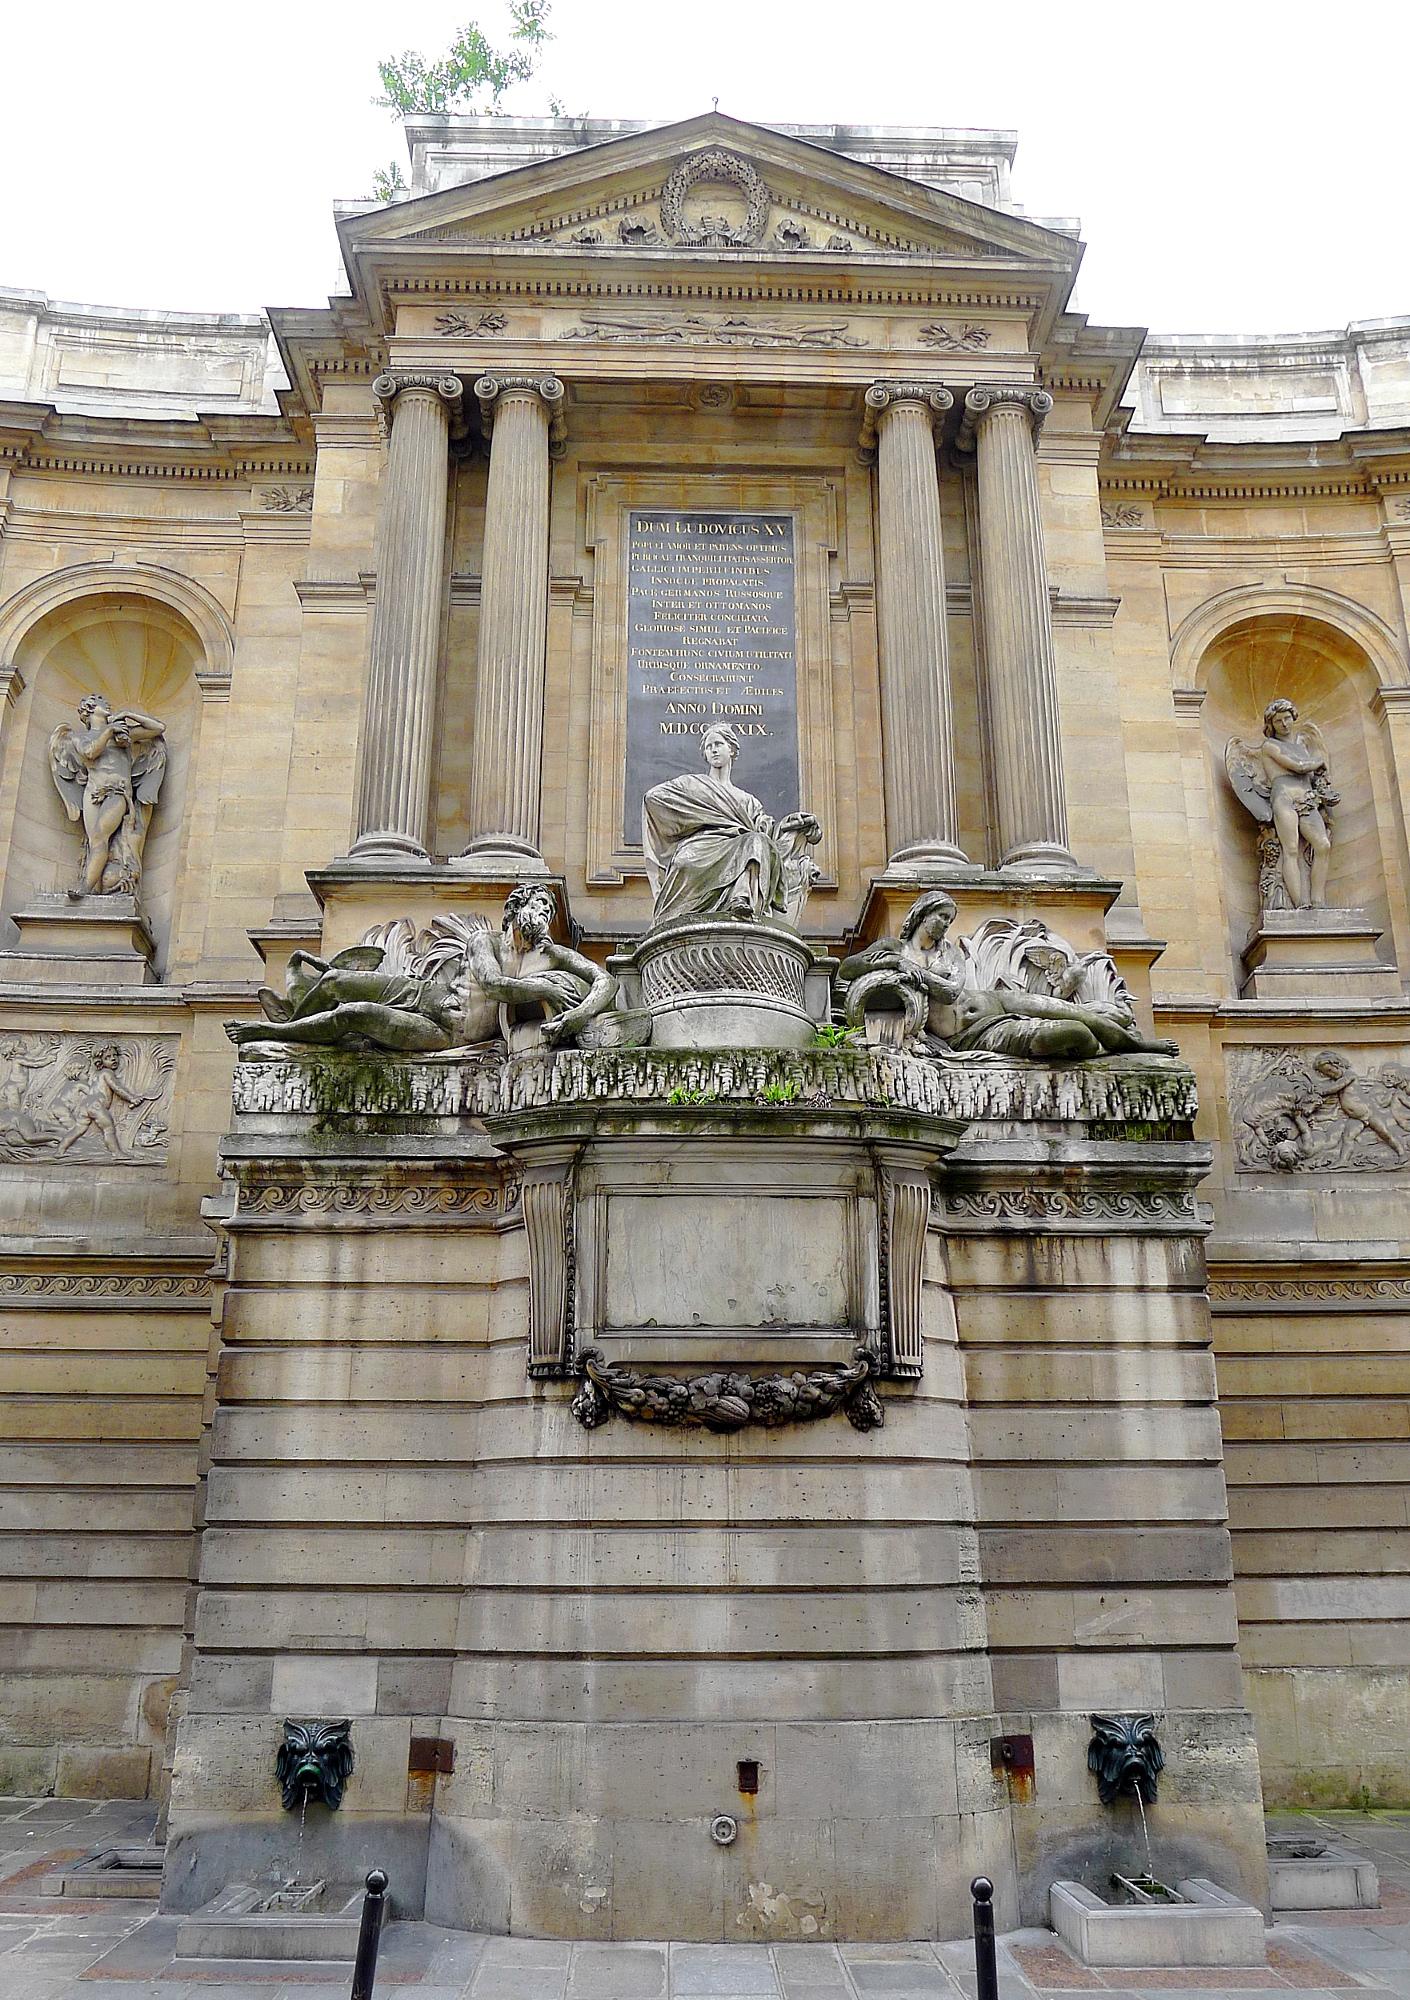 https://upload.wikimedia.org/wikipedia/commons/0/0e/P1110393_Paris_VII_fontaine_des_quatre_saisons_rwk.JPG